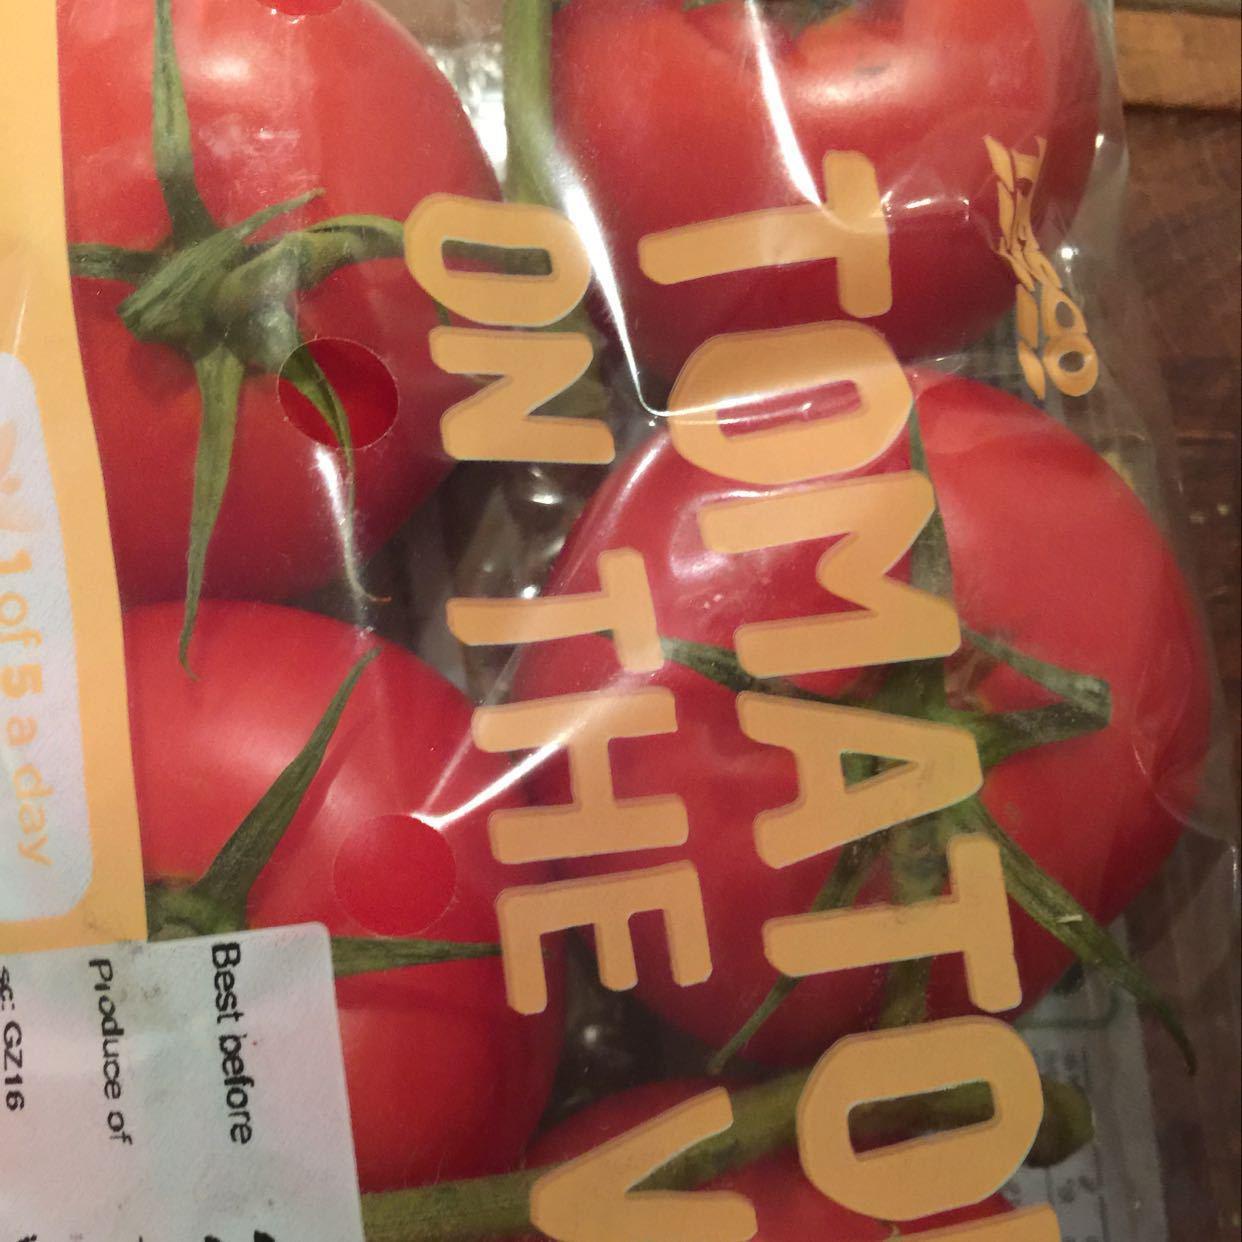 5 fresh tomatoes